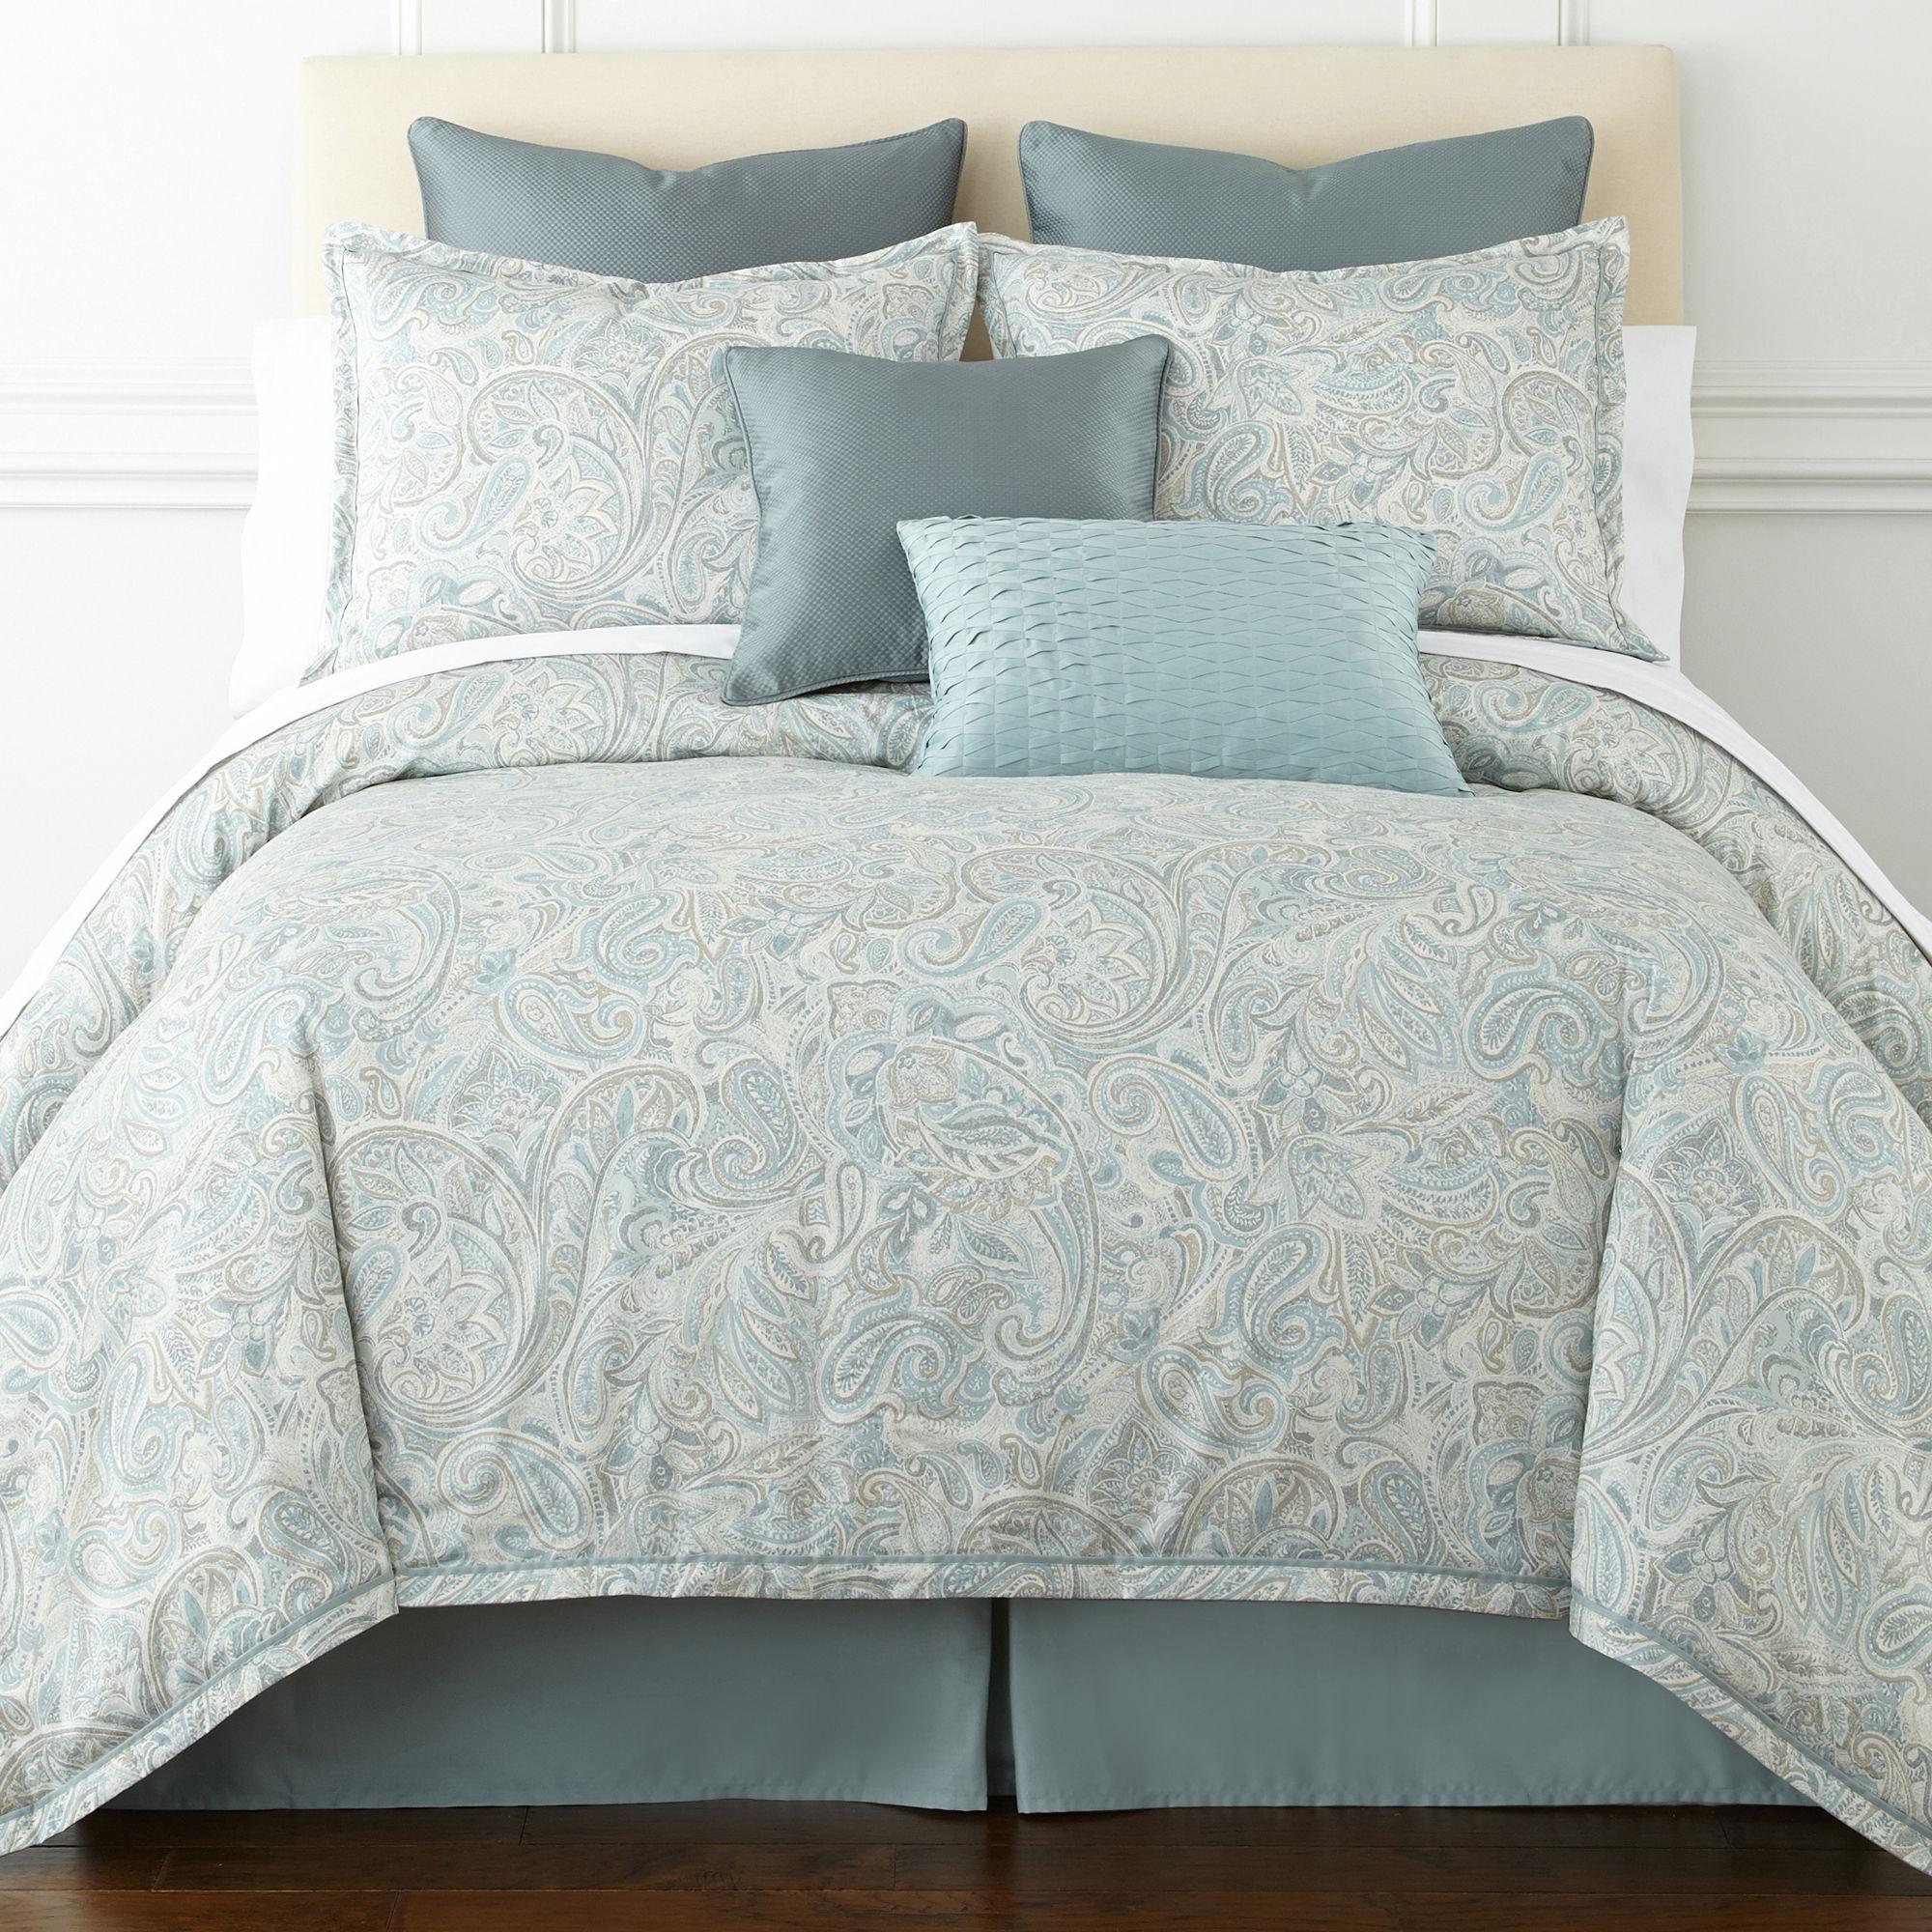 Buy Liz Claiborne Amhurst 4 Pc Paisley Comforter Set